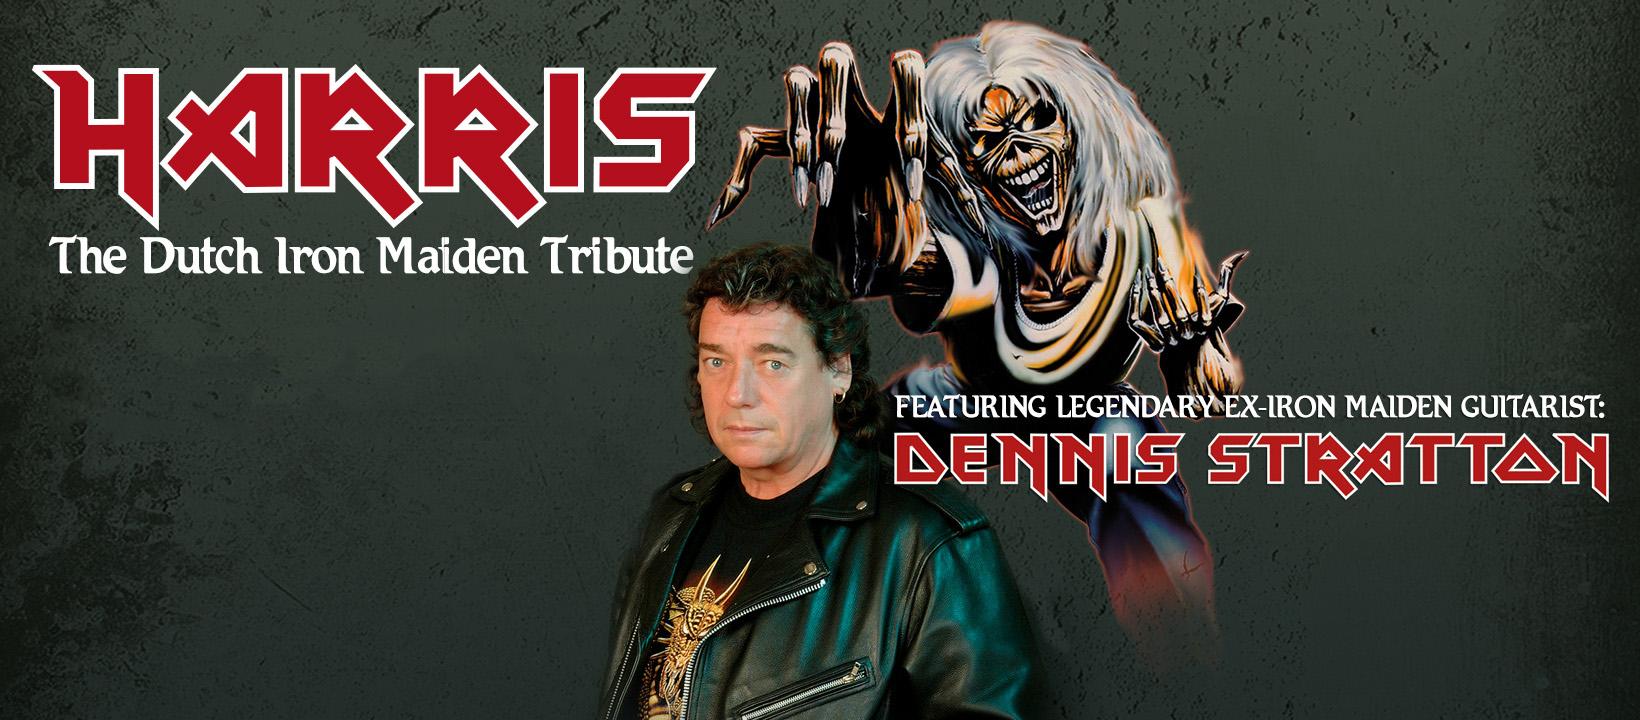 Iron Maiden Tribute Harris & Stratton in P60